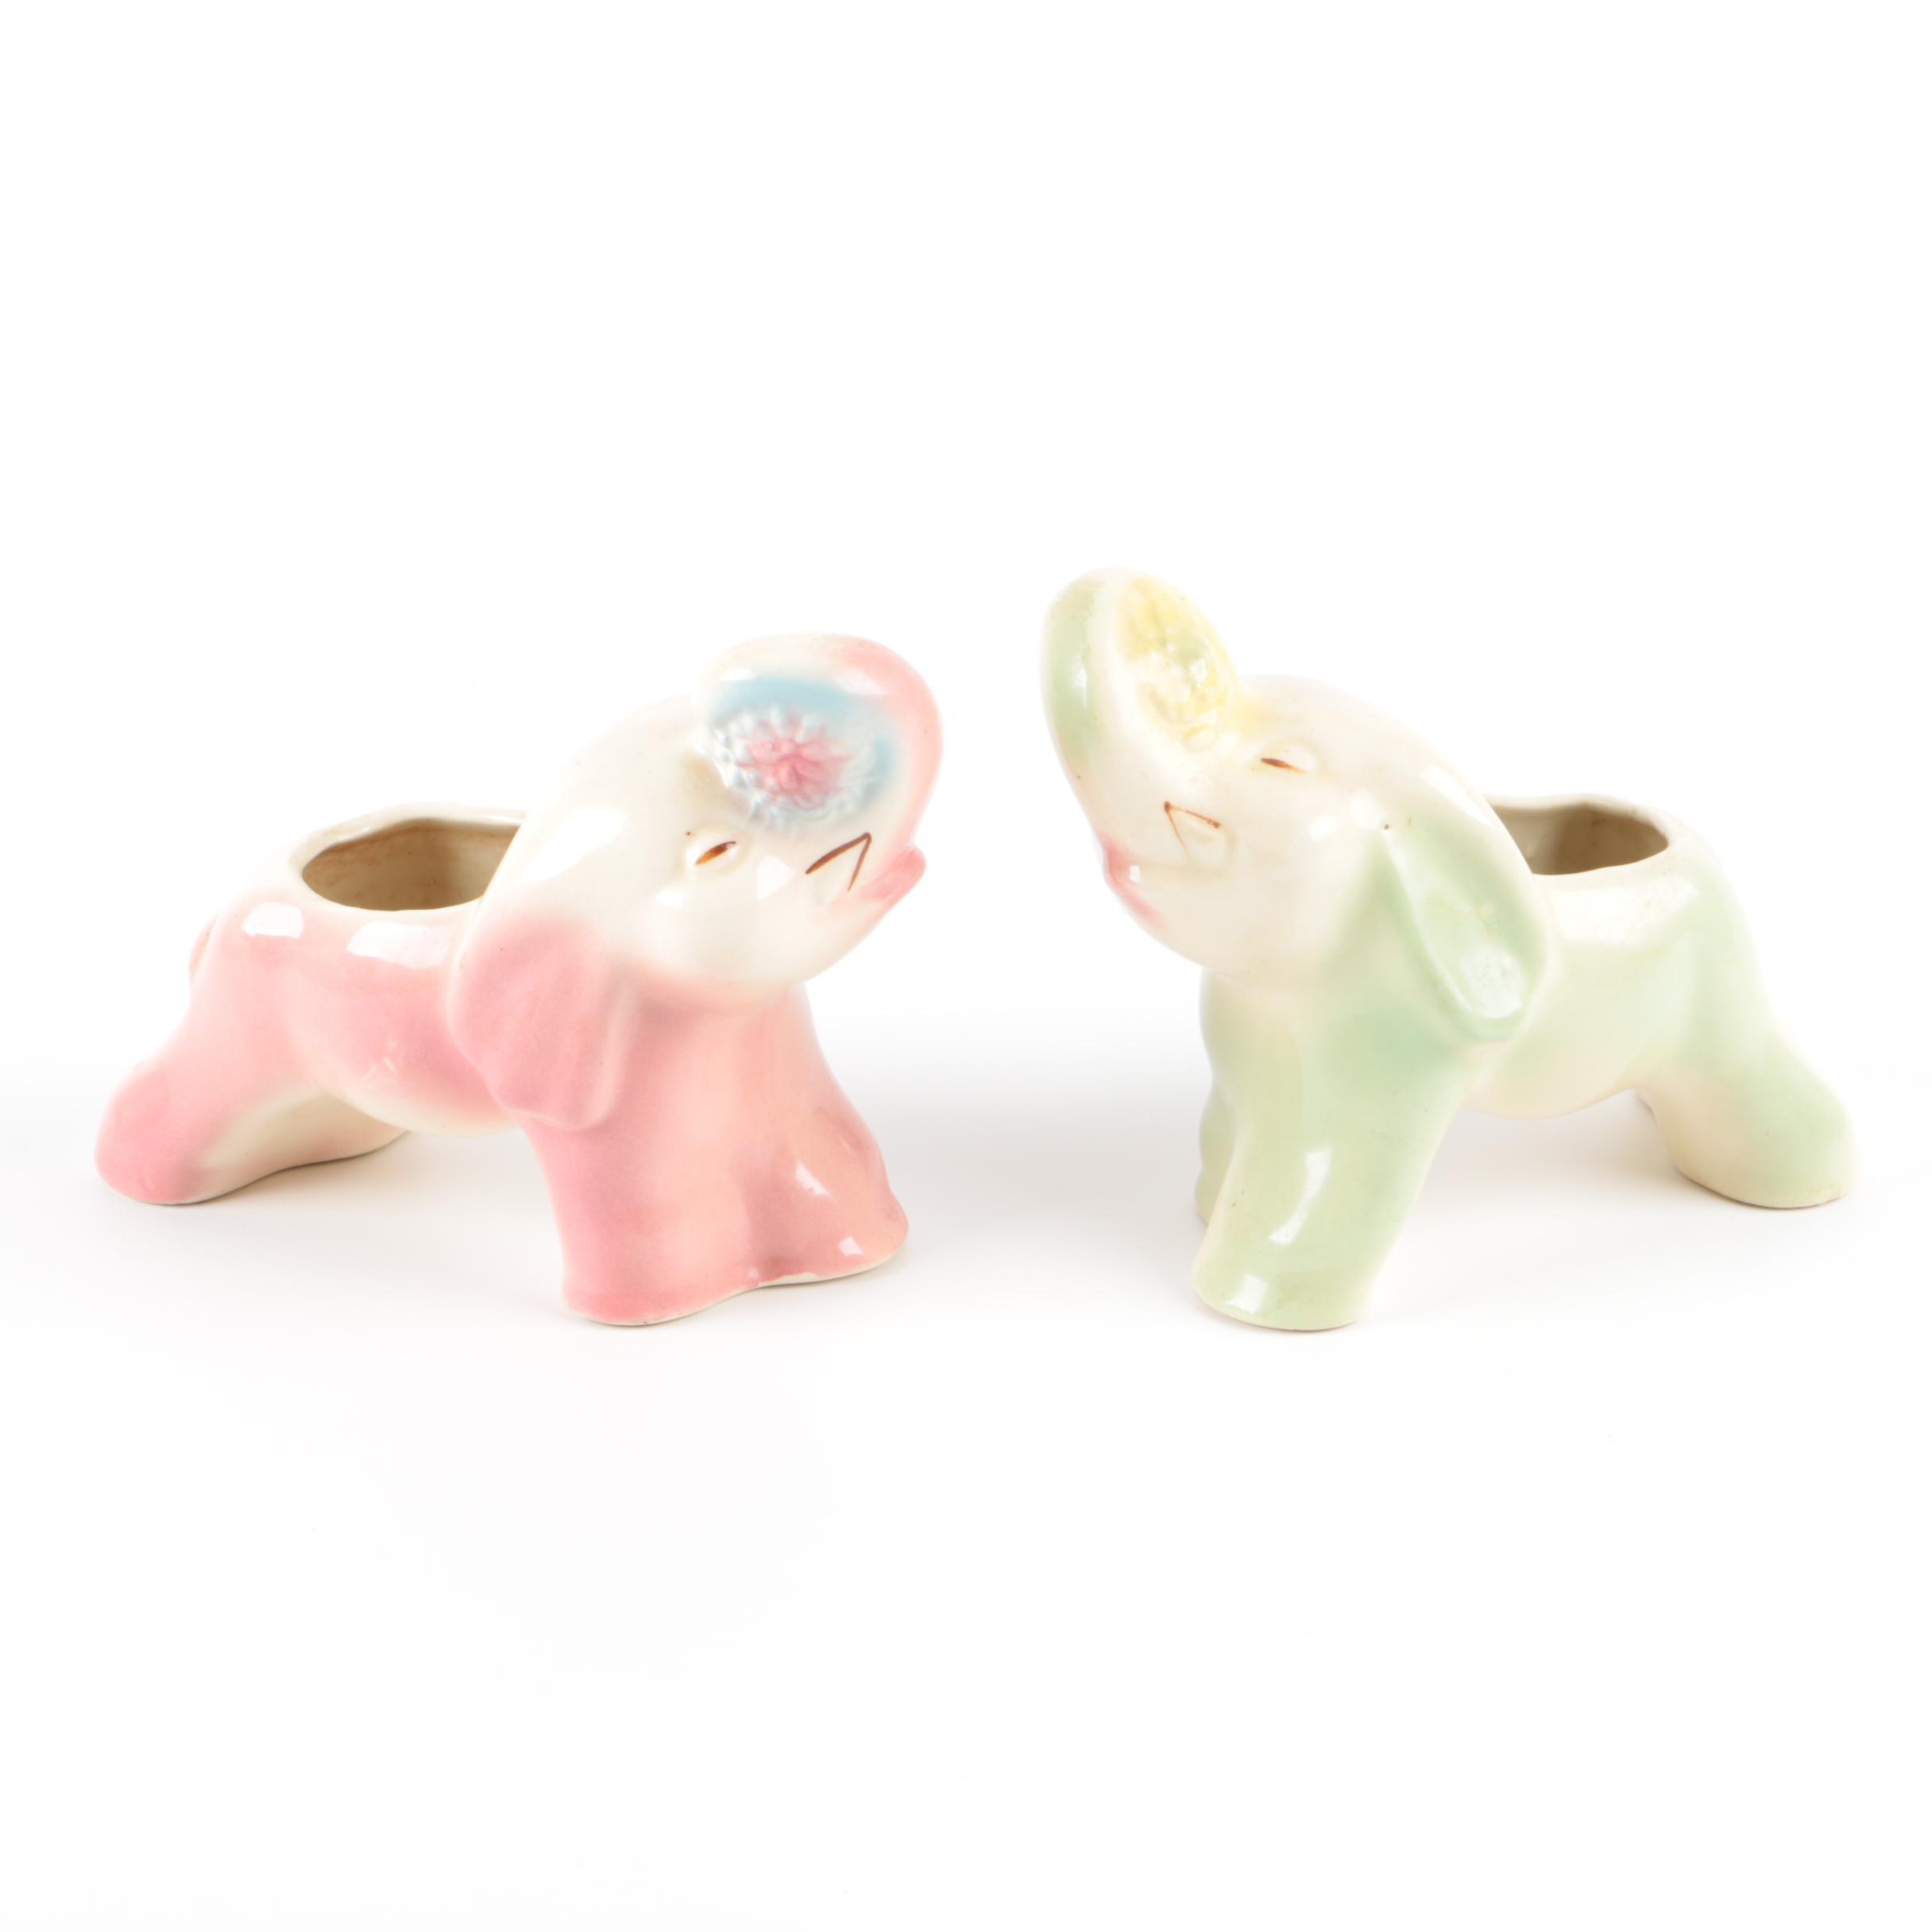 Vintage Ceramic Elephant Figurine Planters